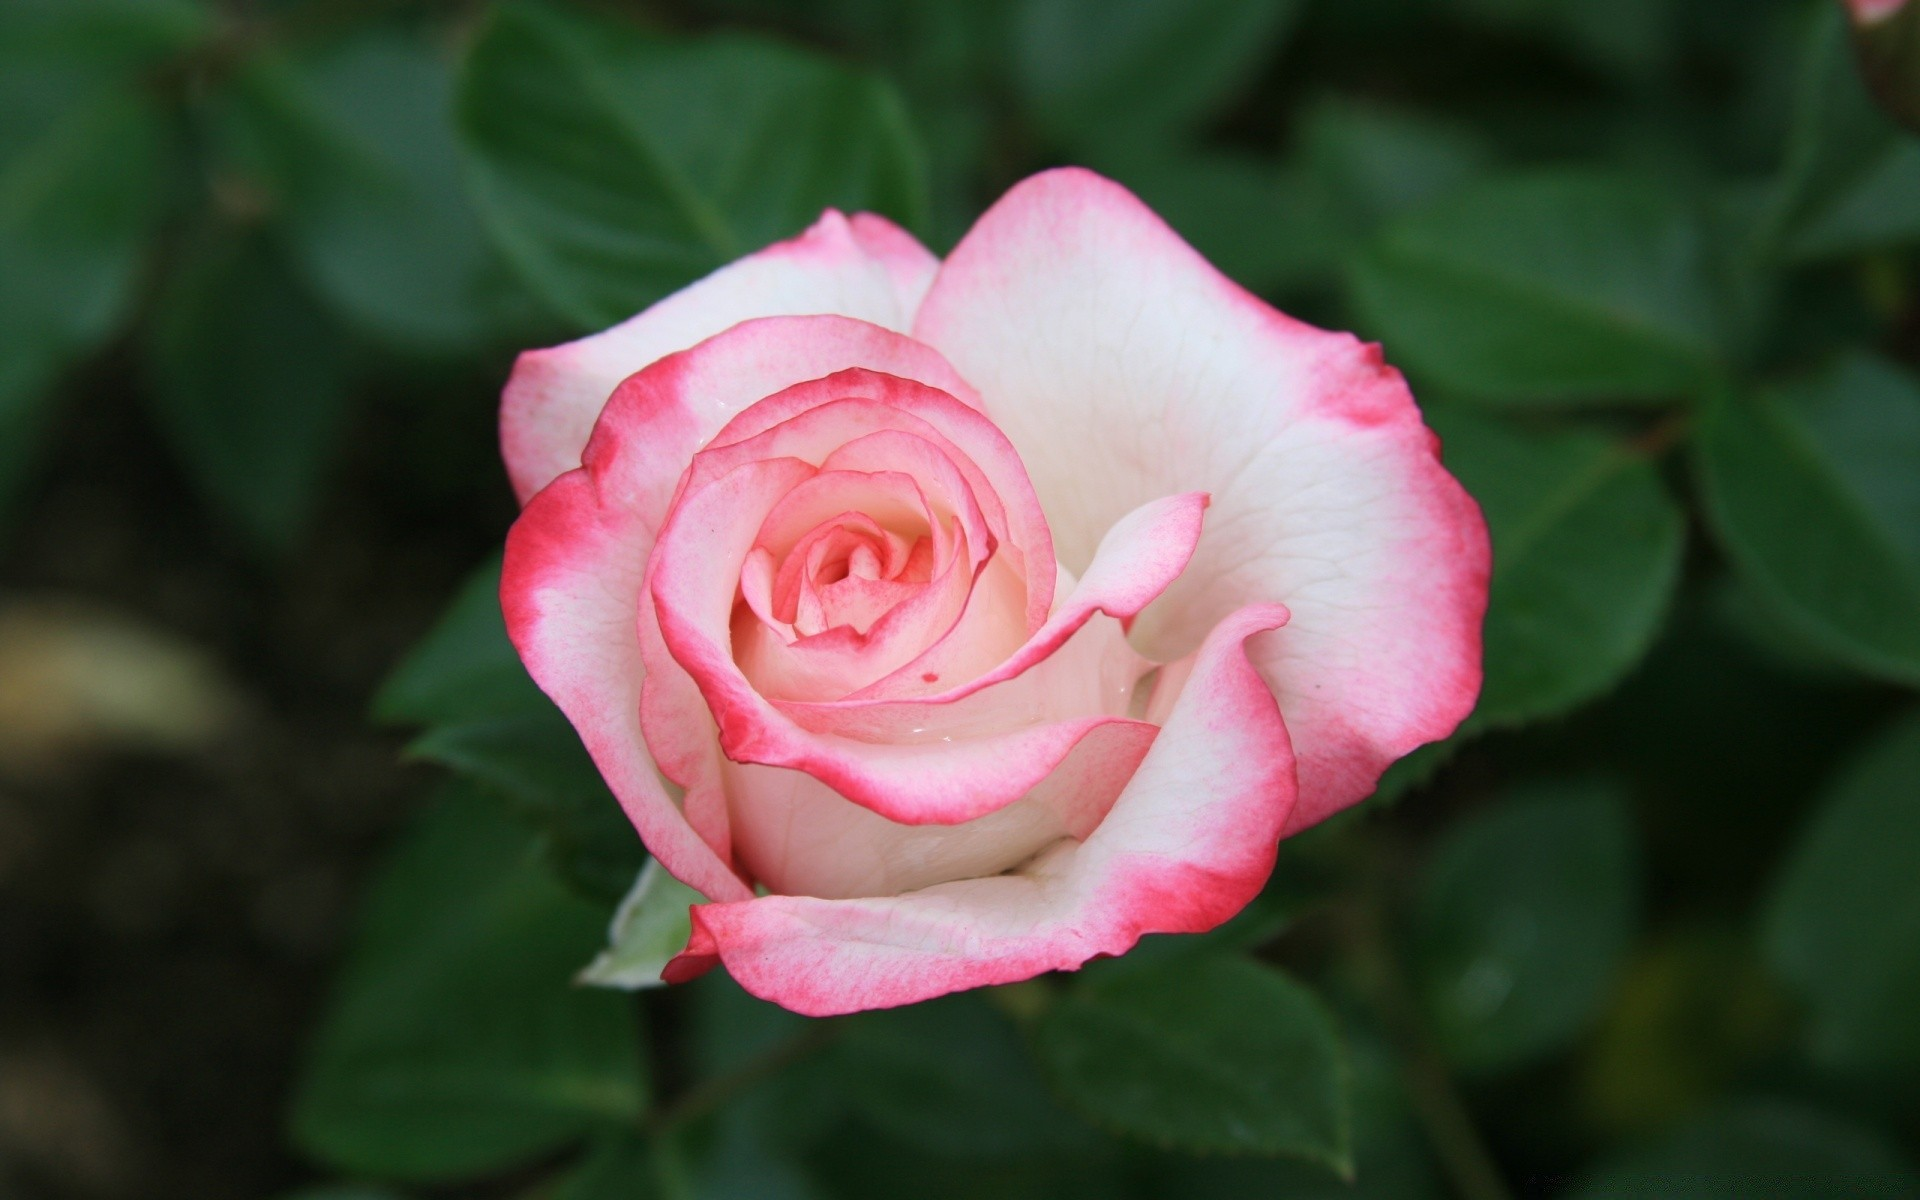 Поздравления днем, картинки с розами фото